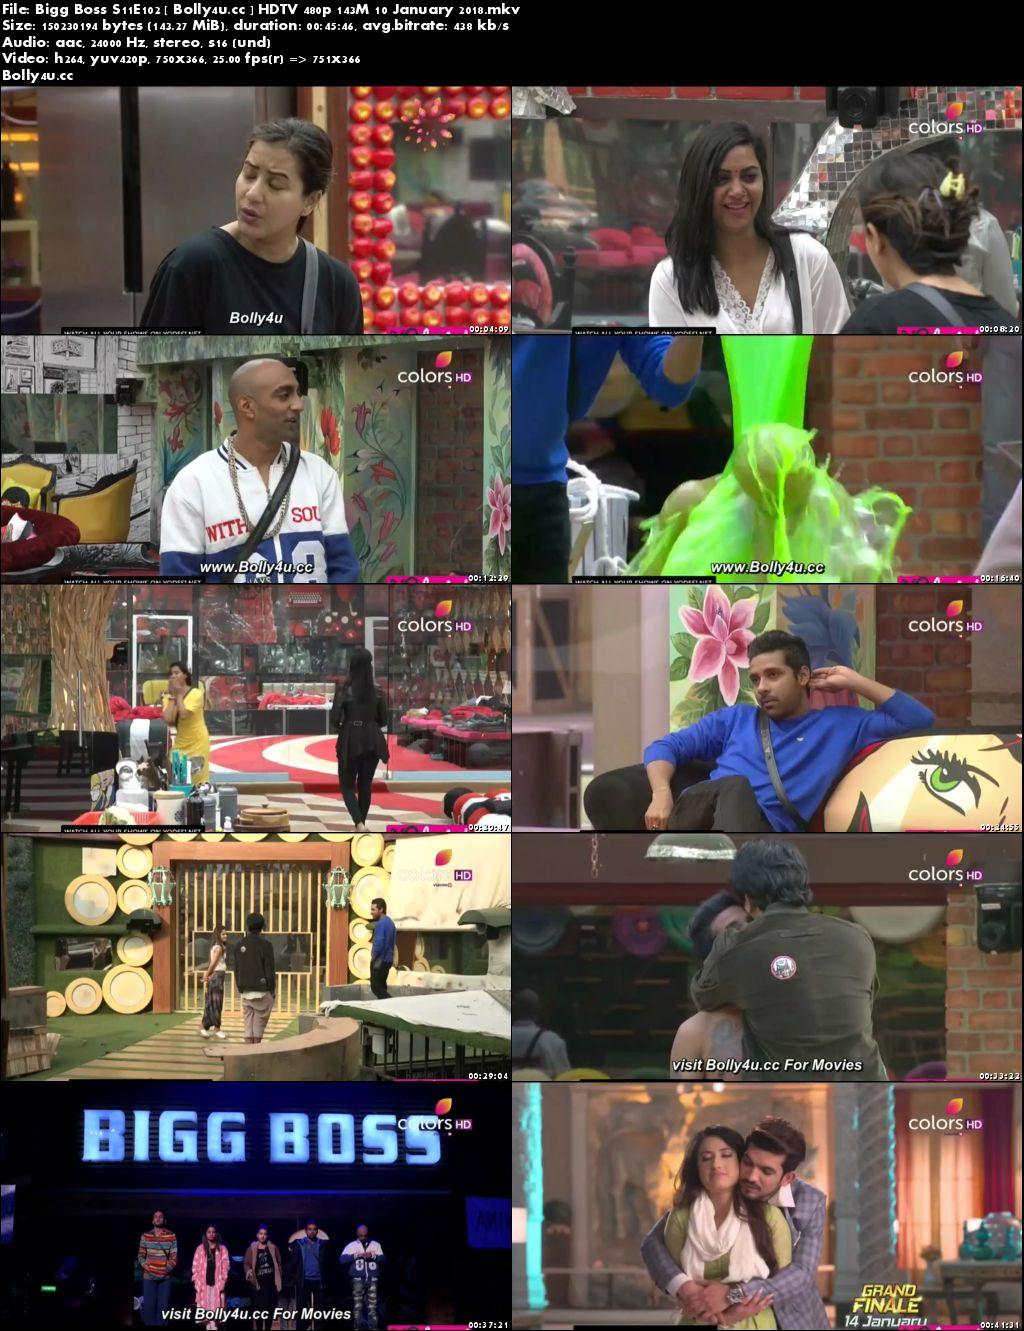 Bigg Boss S11E102 HDTV 480p 140Mb 10 January 2018 Download